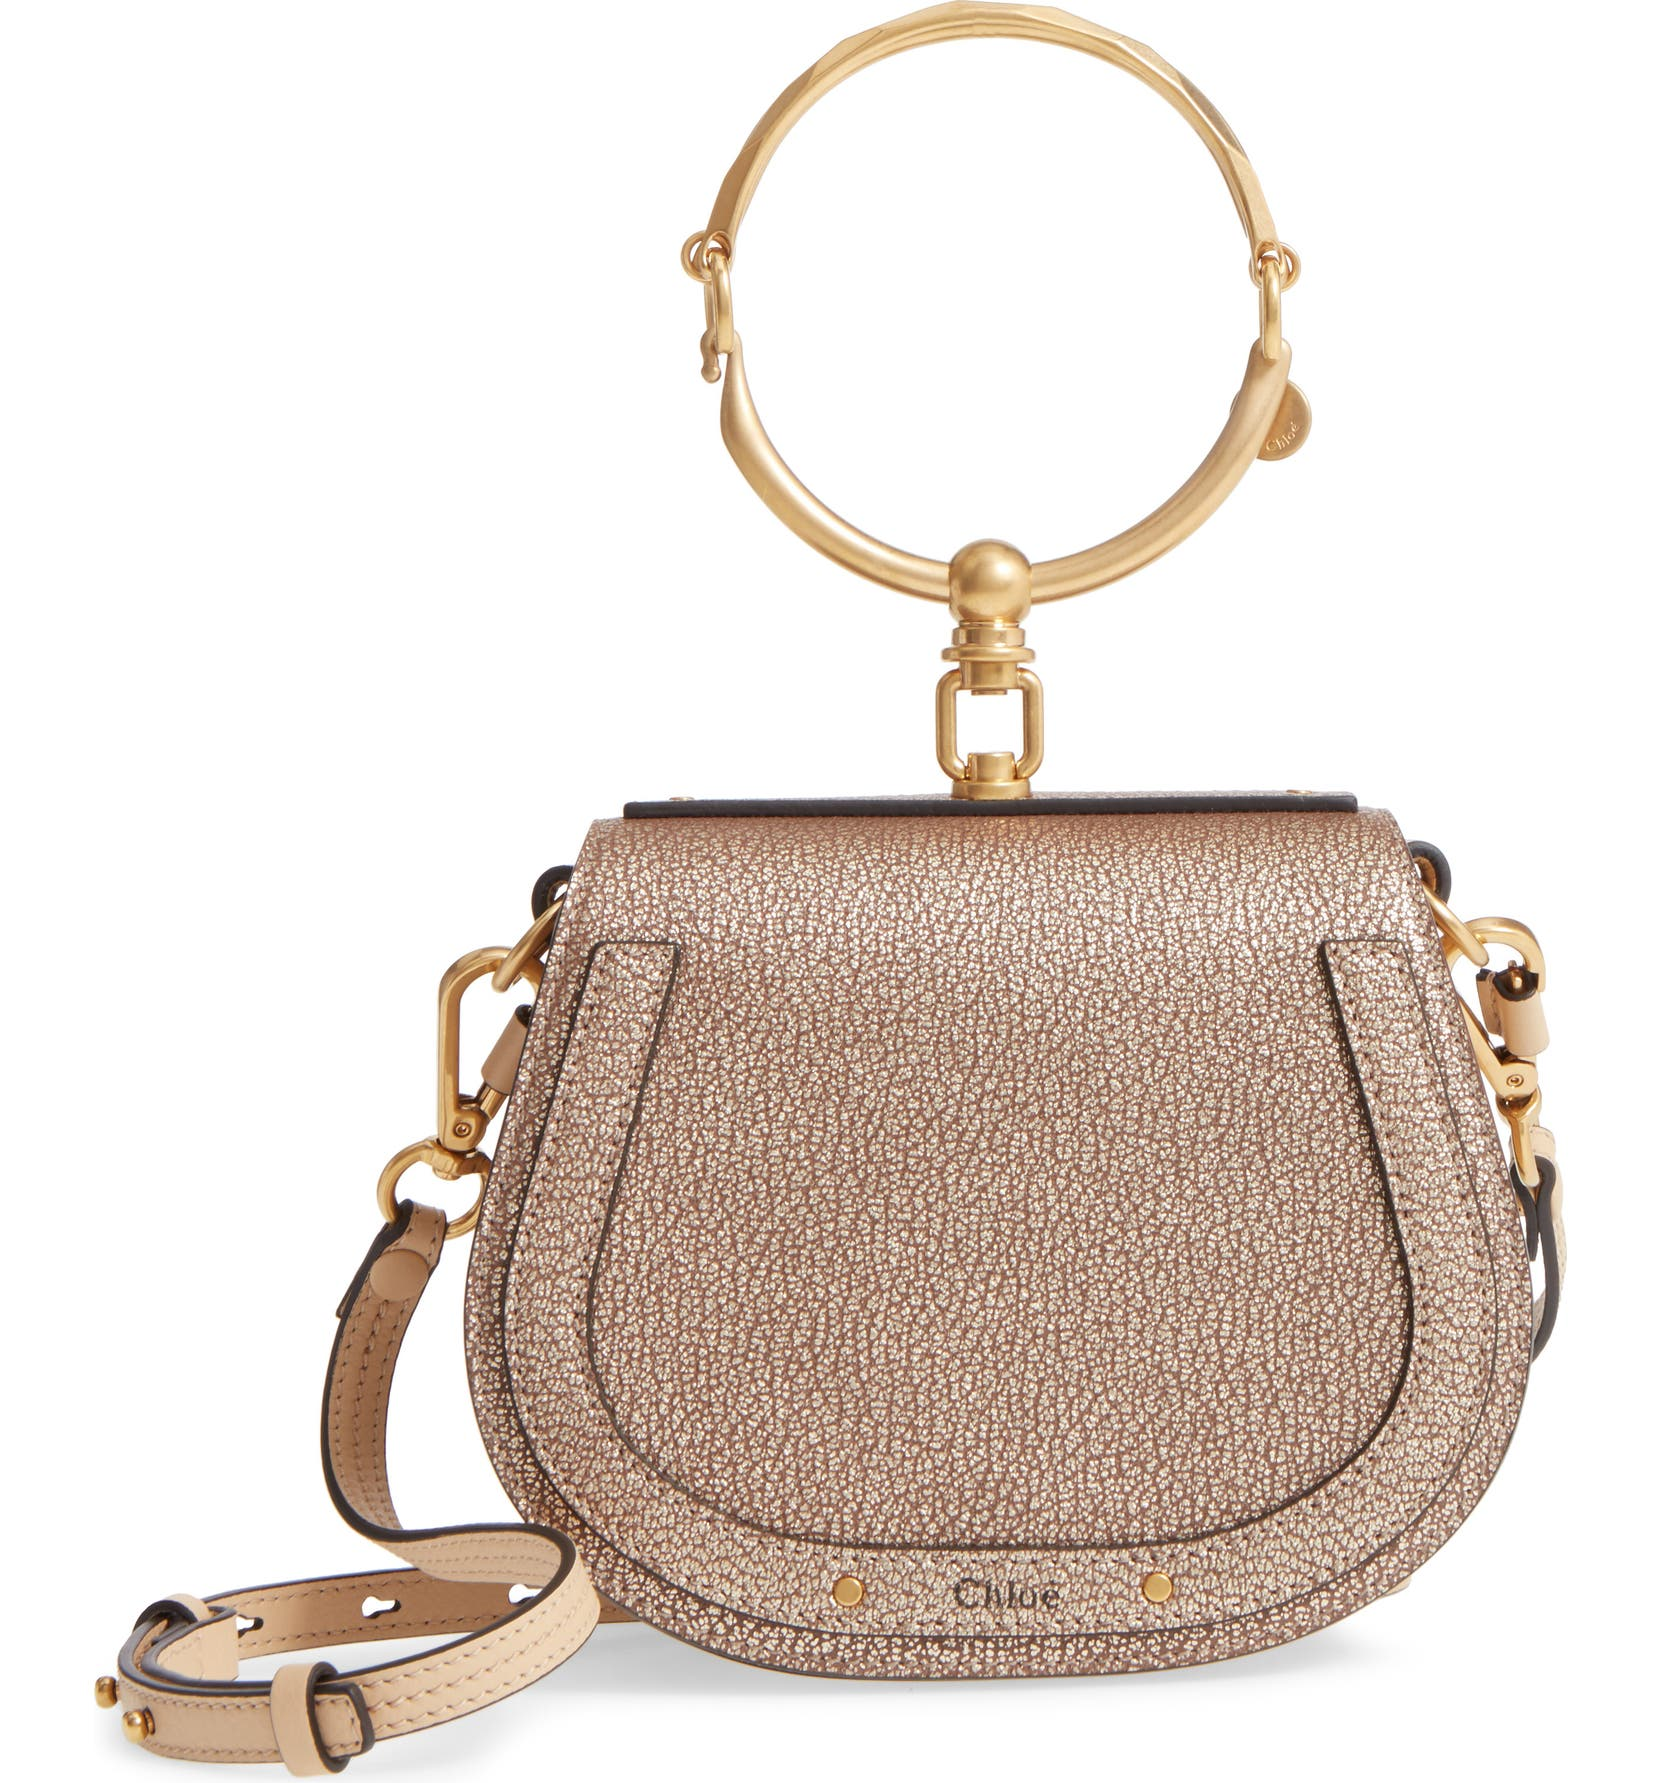 dd4a15f817 Small Nile Bracelet Metallic Leather Crossbody Bag